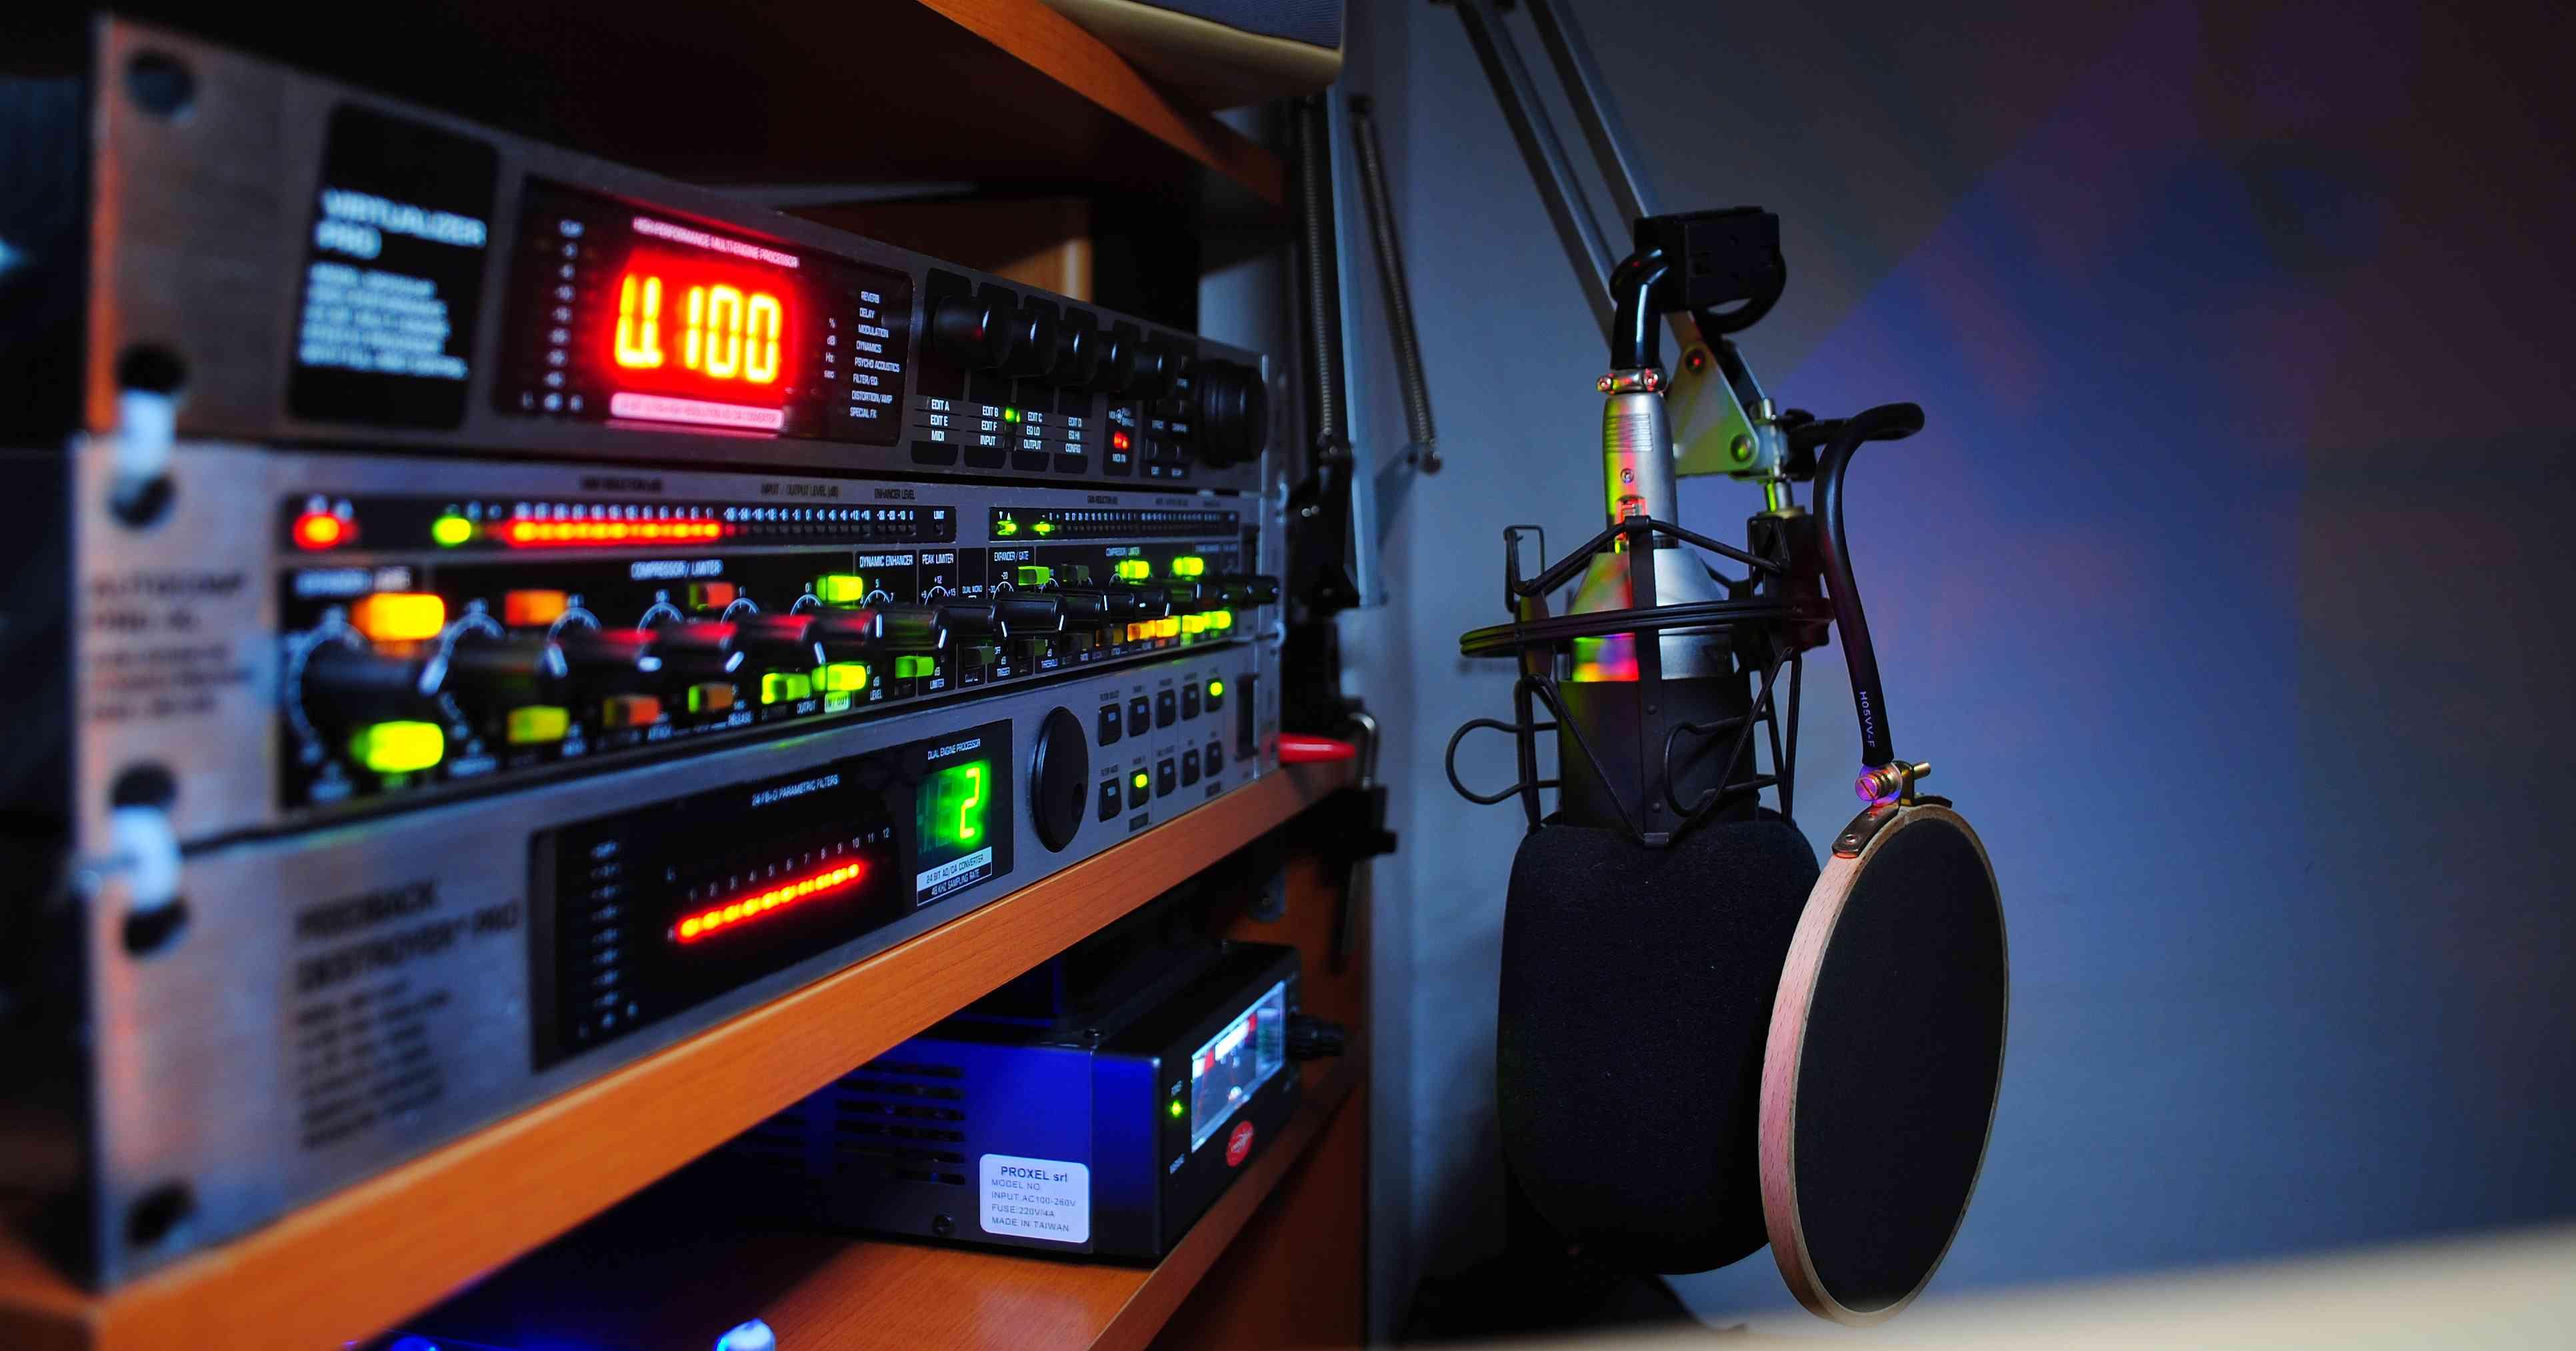 YO3IBW Hi-Fi ESSB Voodoo Audio Amateur Radio Station